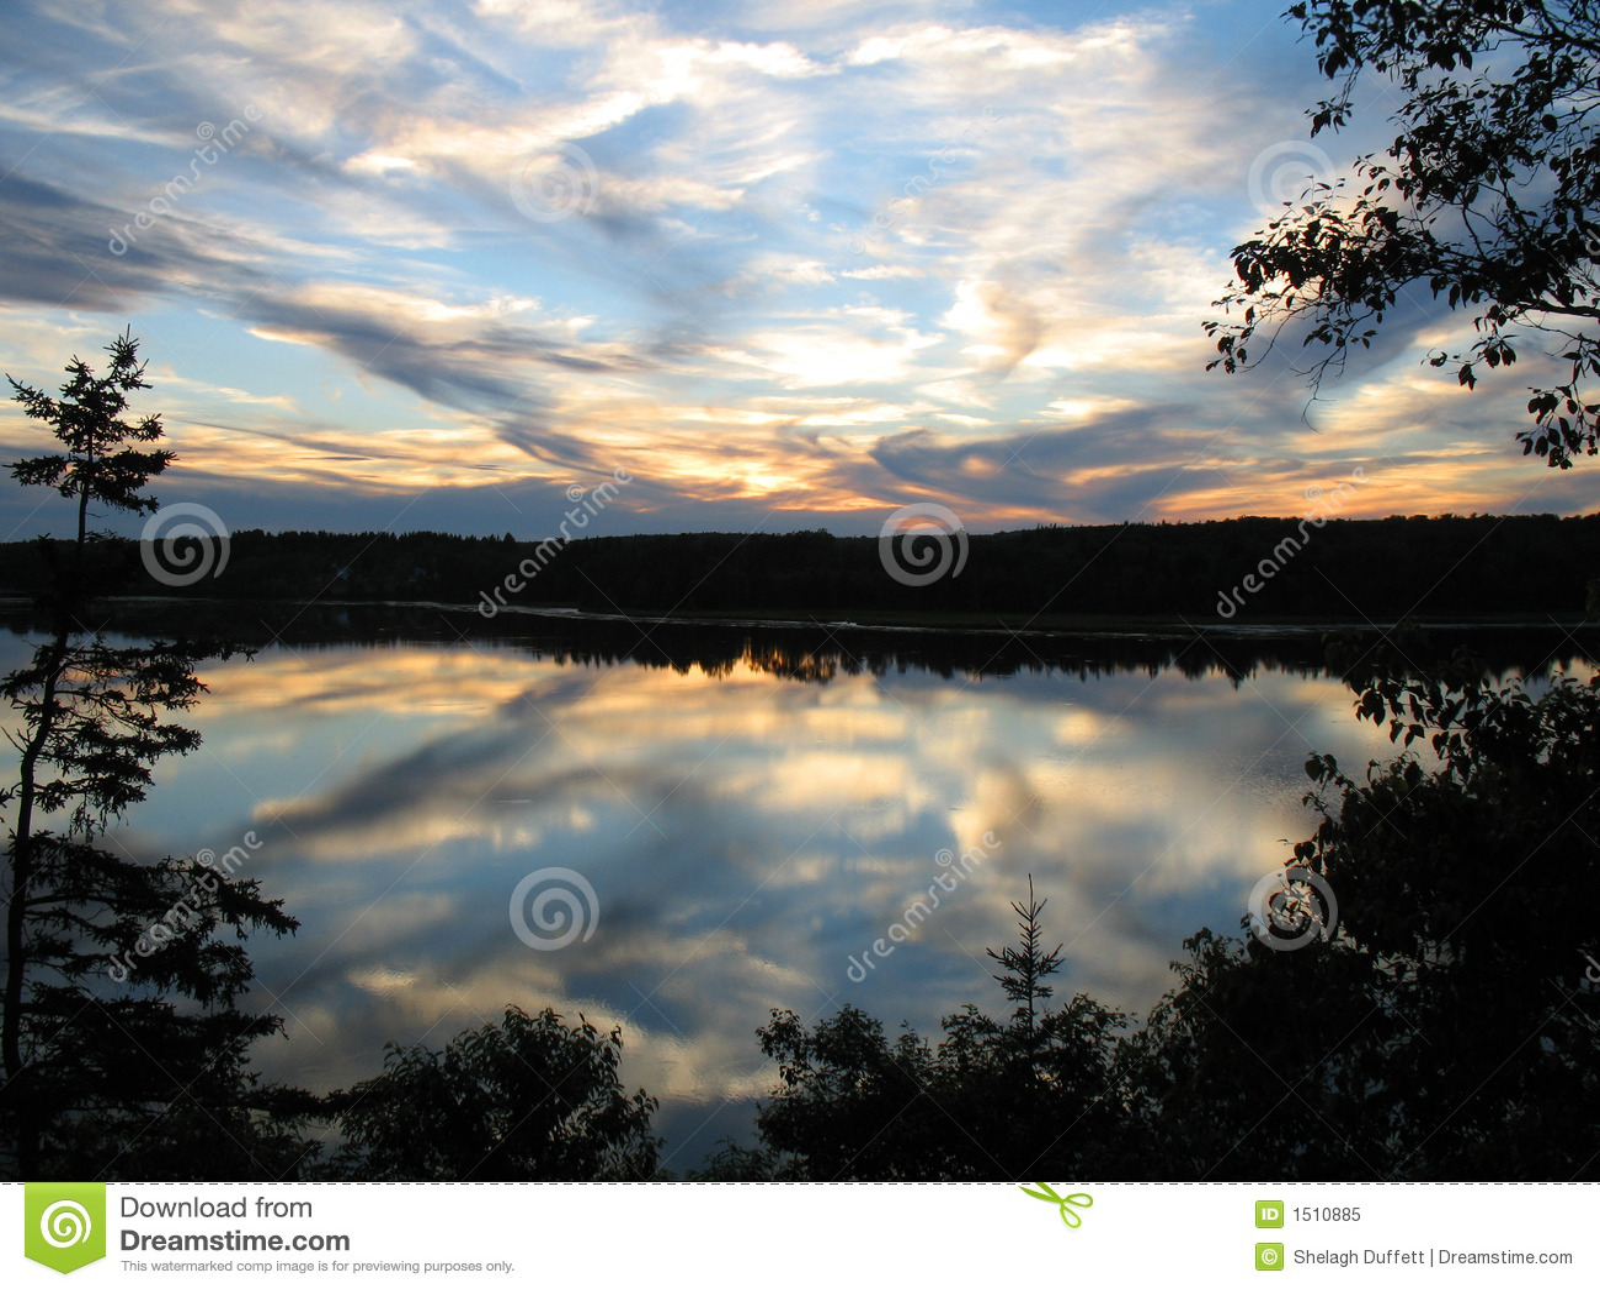 nova scotia sunset royalty free stock photo